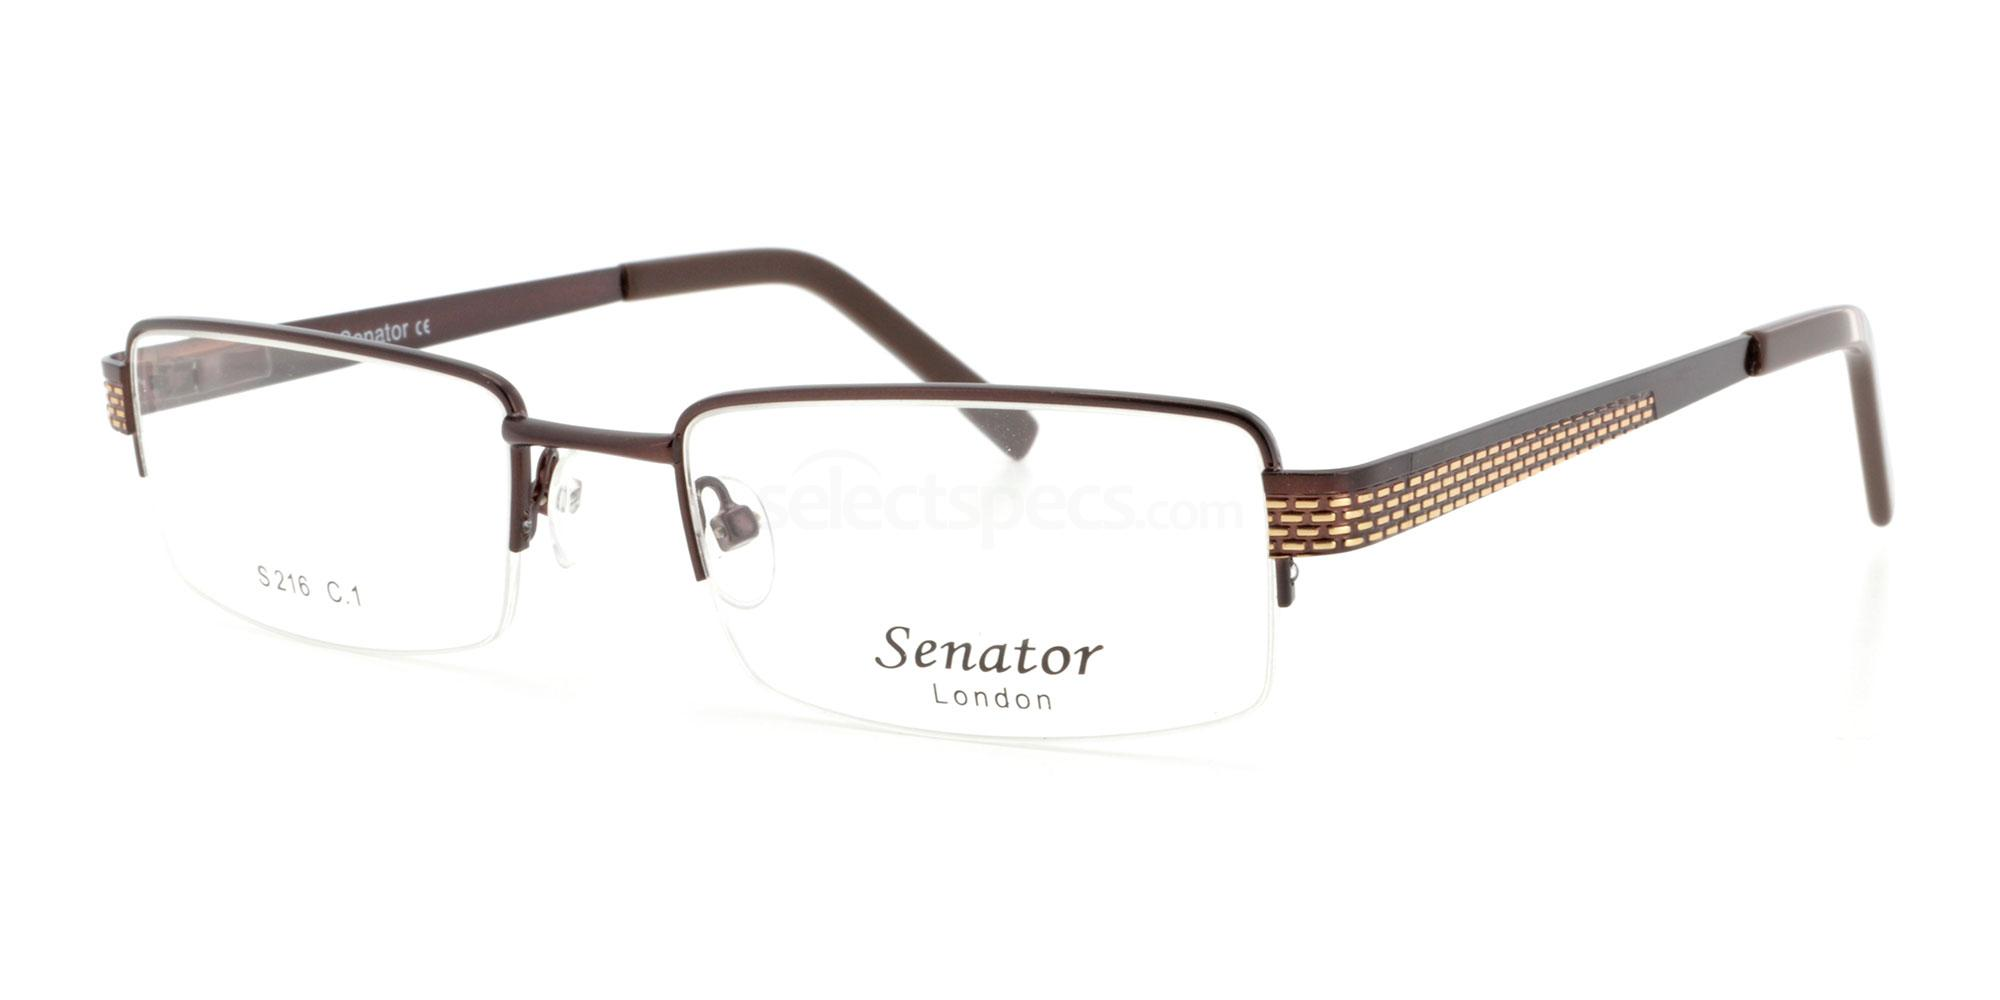 C1 SENATOR 216 Glasses, Senator